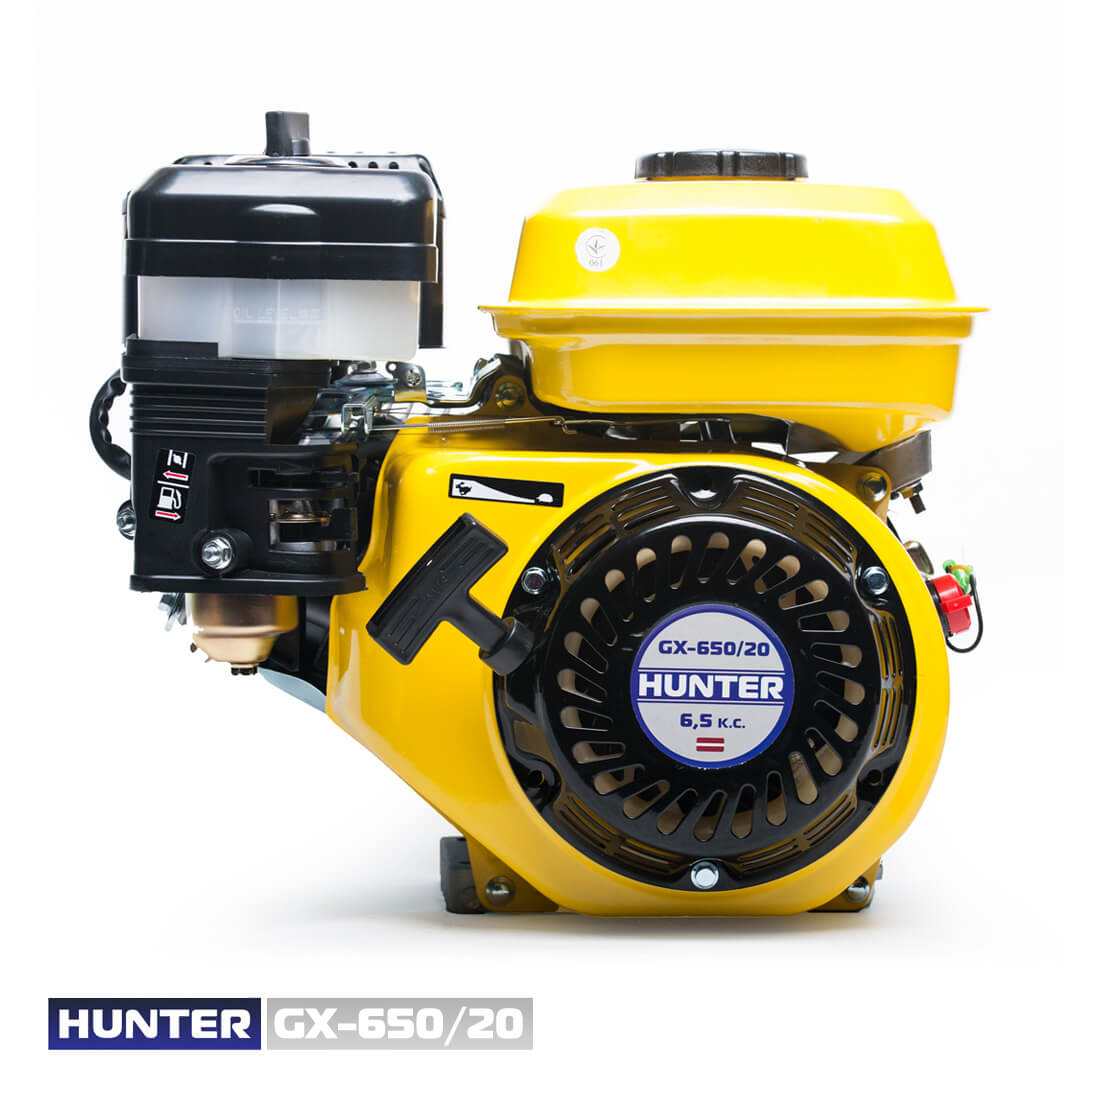 Фото GX-650/20 (шпонка) цена 3150грн №2 — Hunter